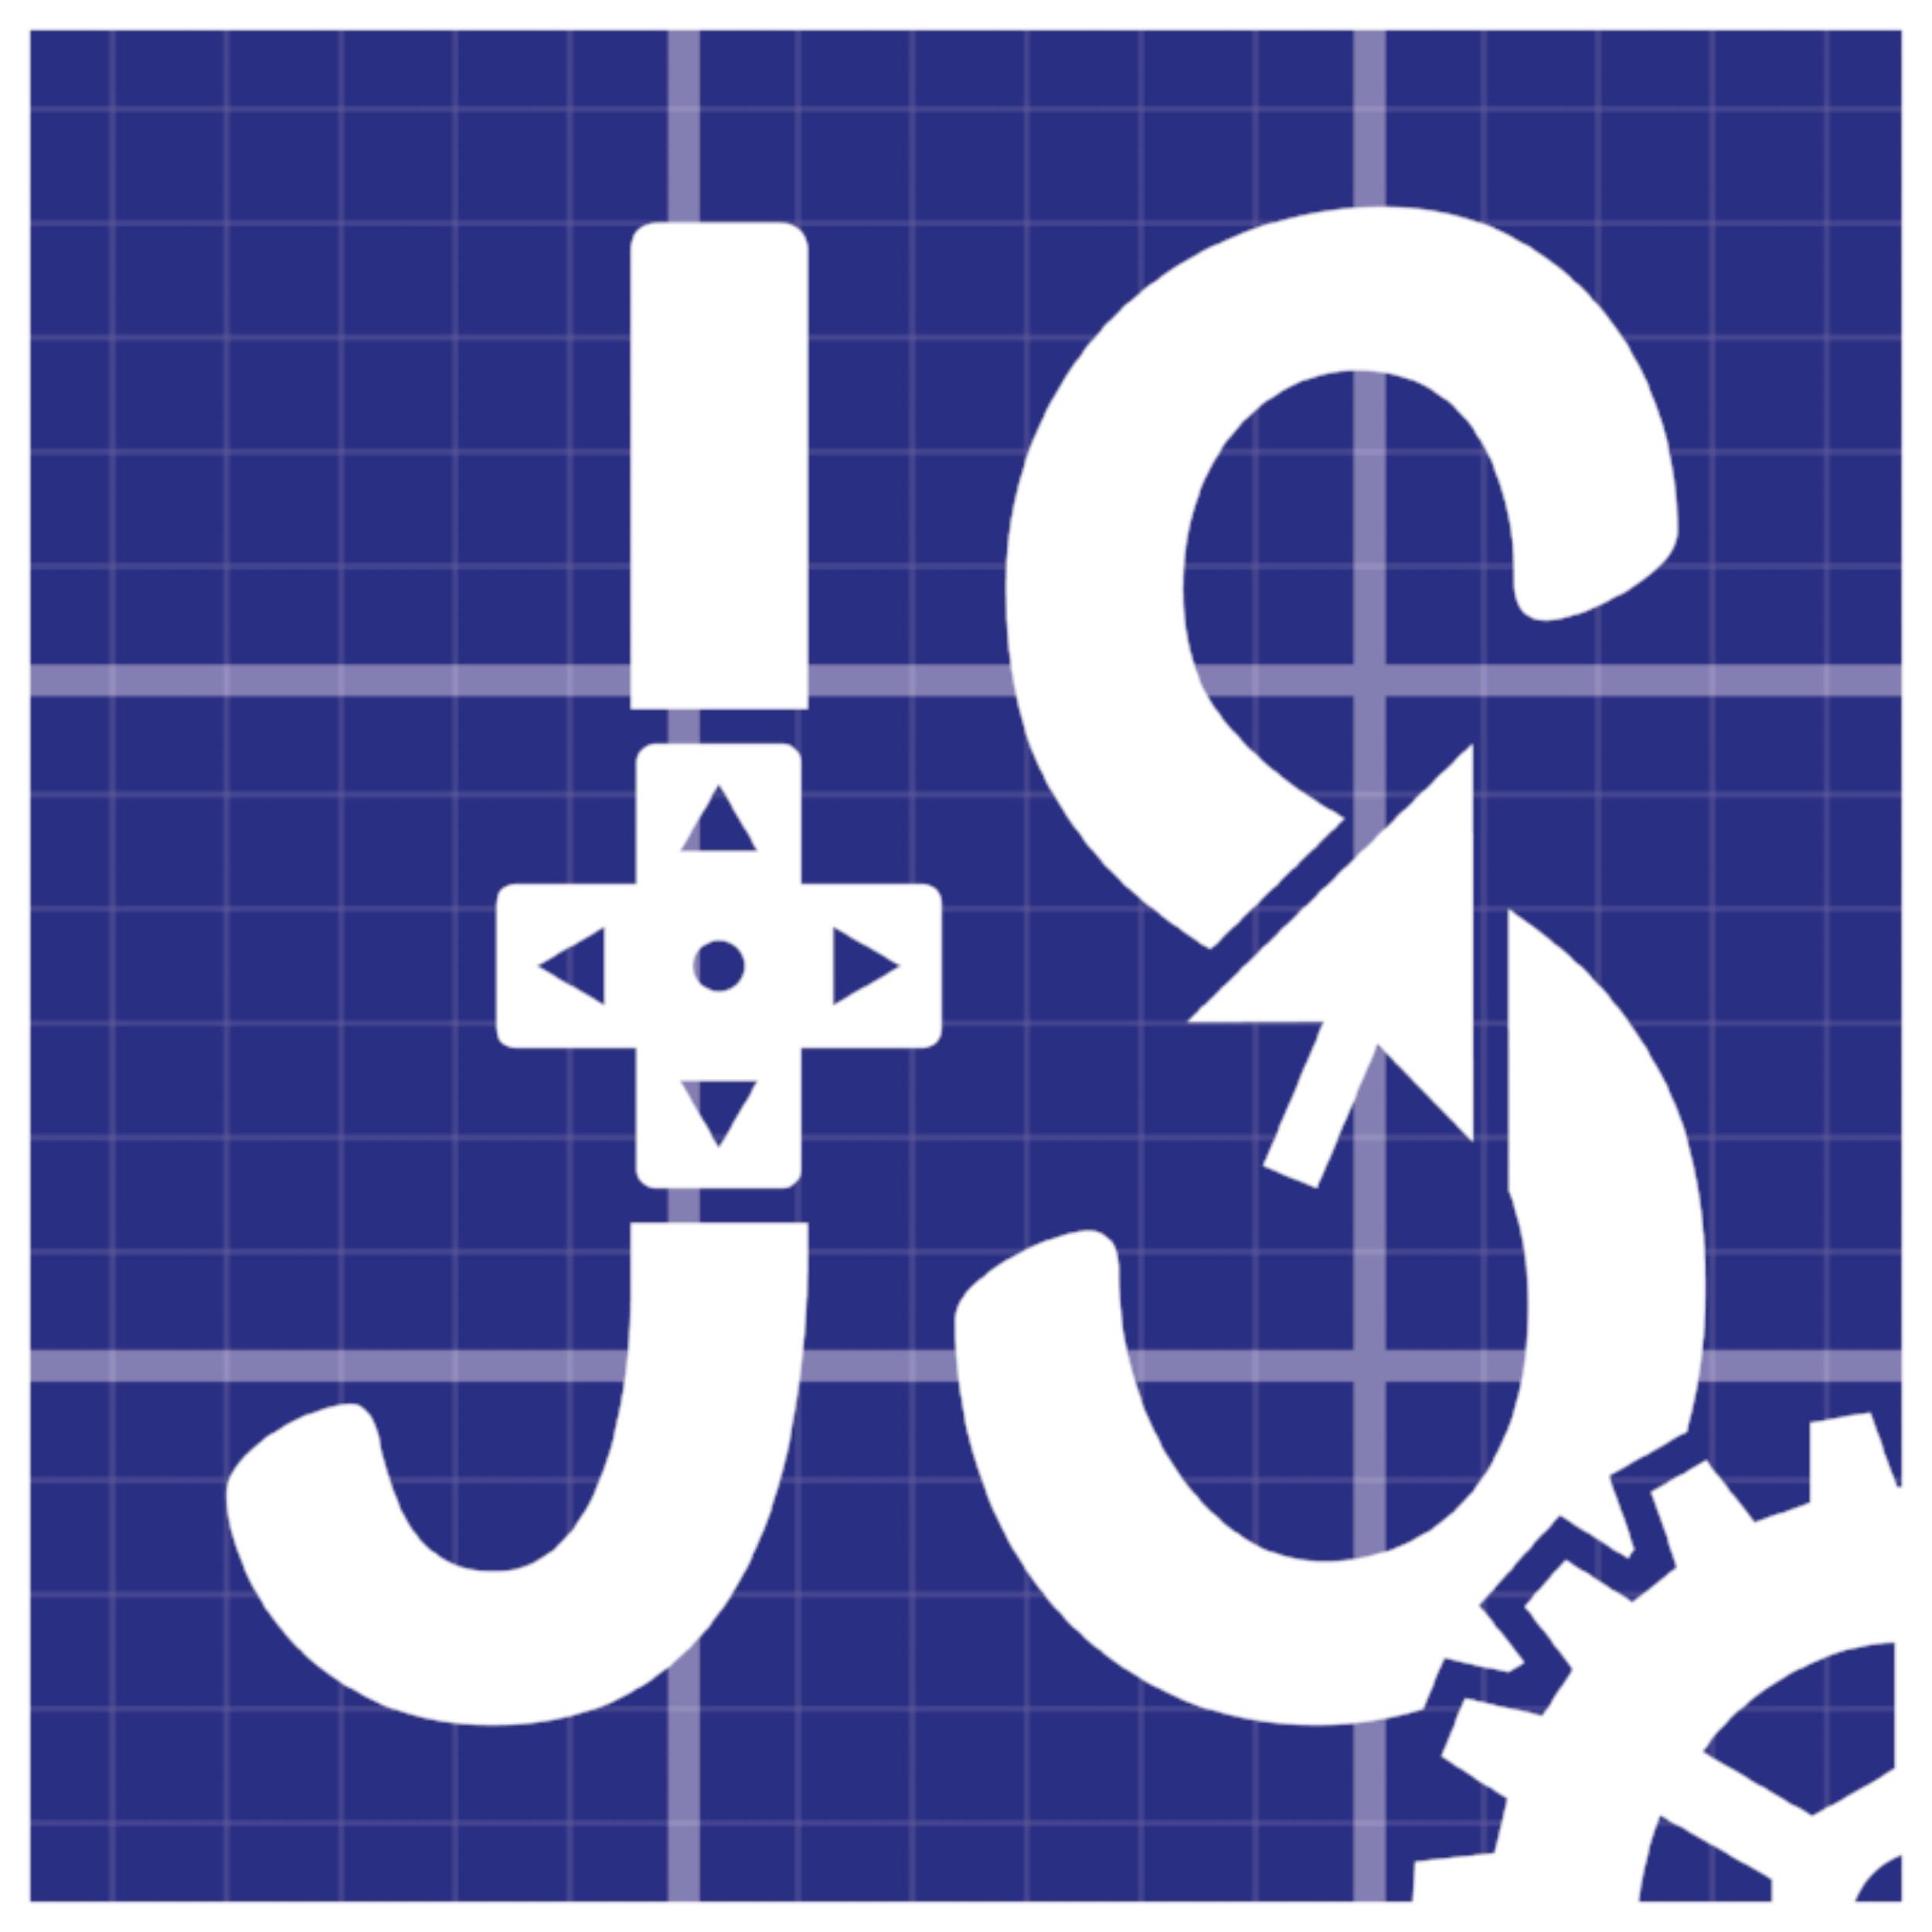 Jack Sextons Game Design Portfolio - Game design portfolio